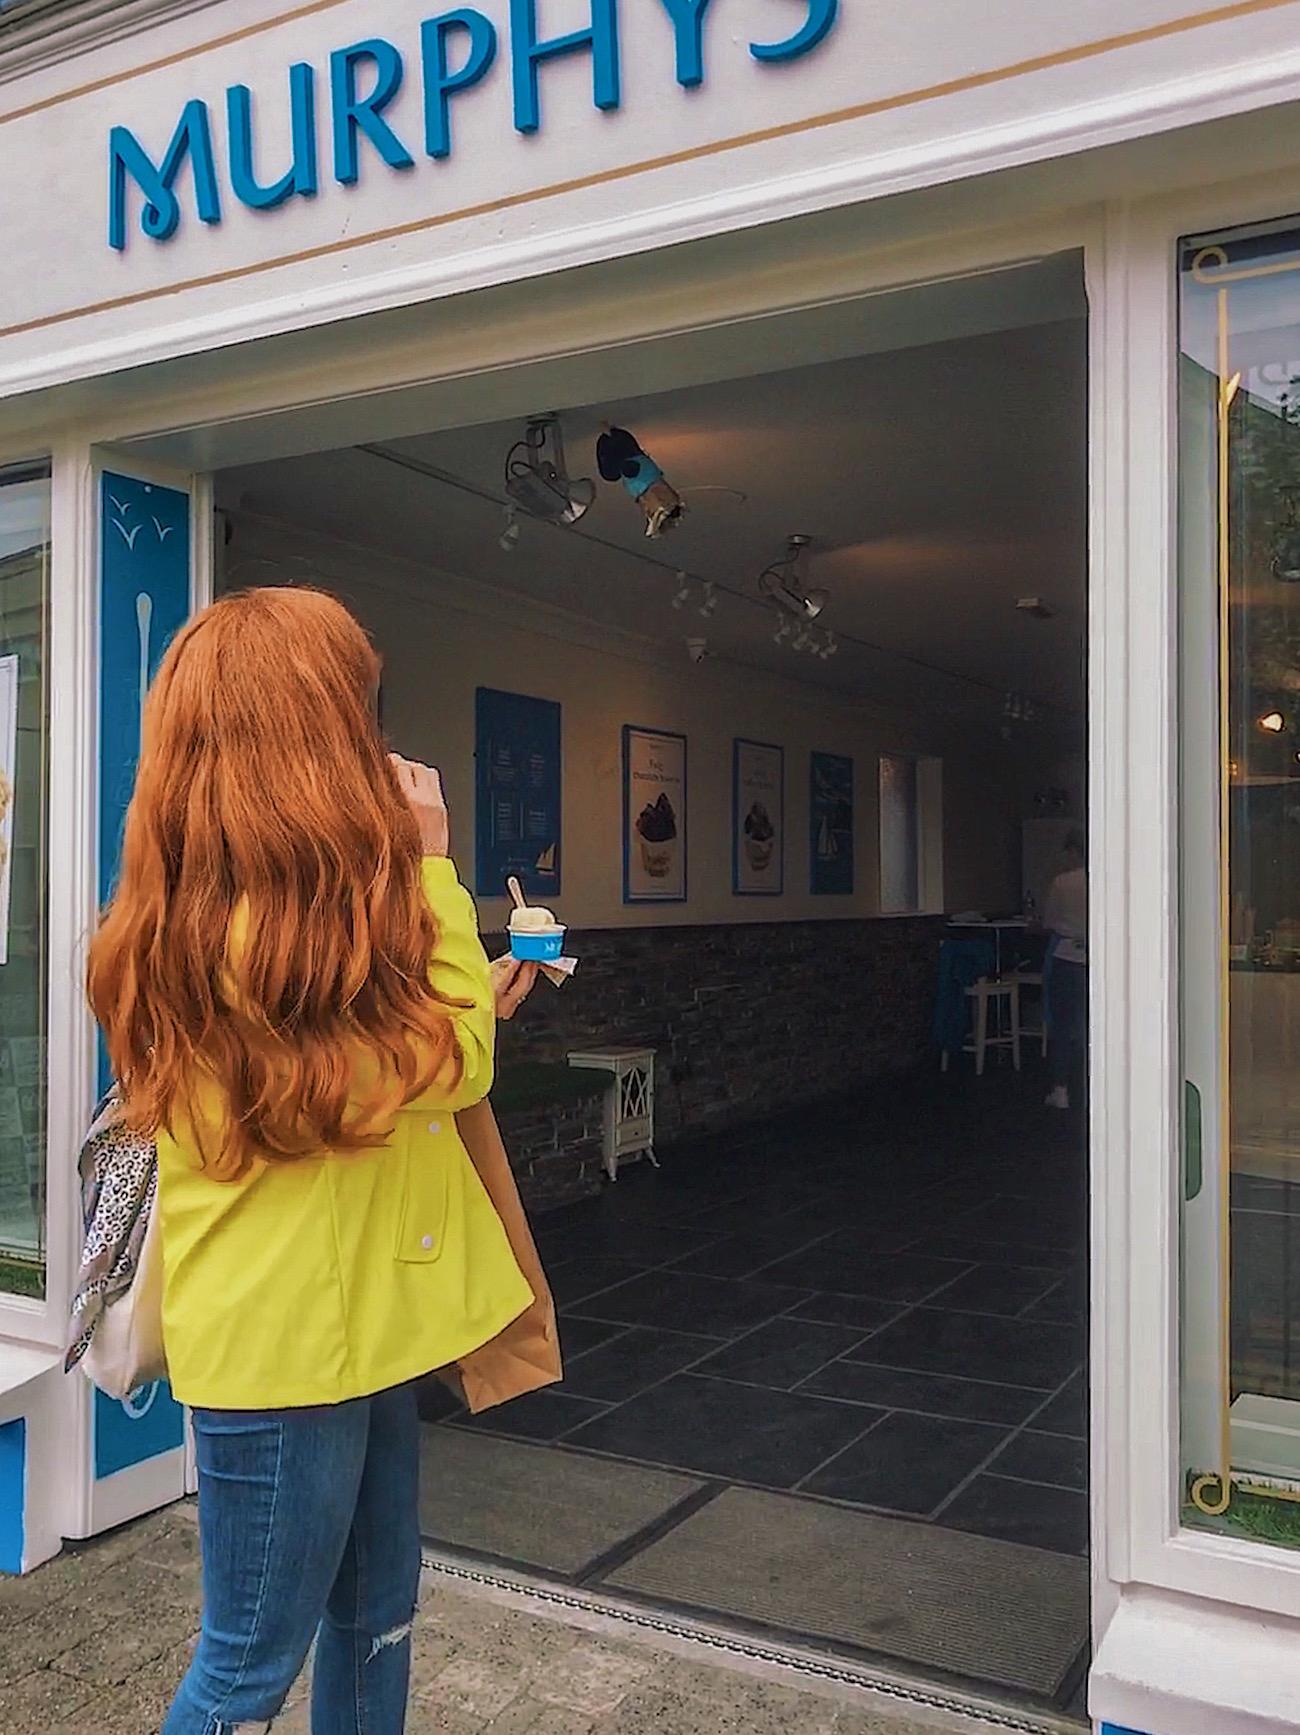 redhead-round-the-world-blogger-ireland-destinations-murphys-ice-cream-dingle.JPG